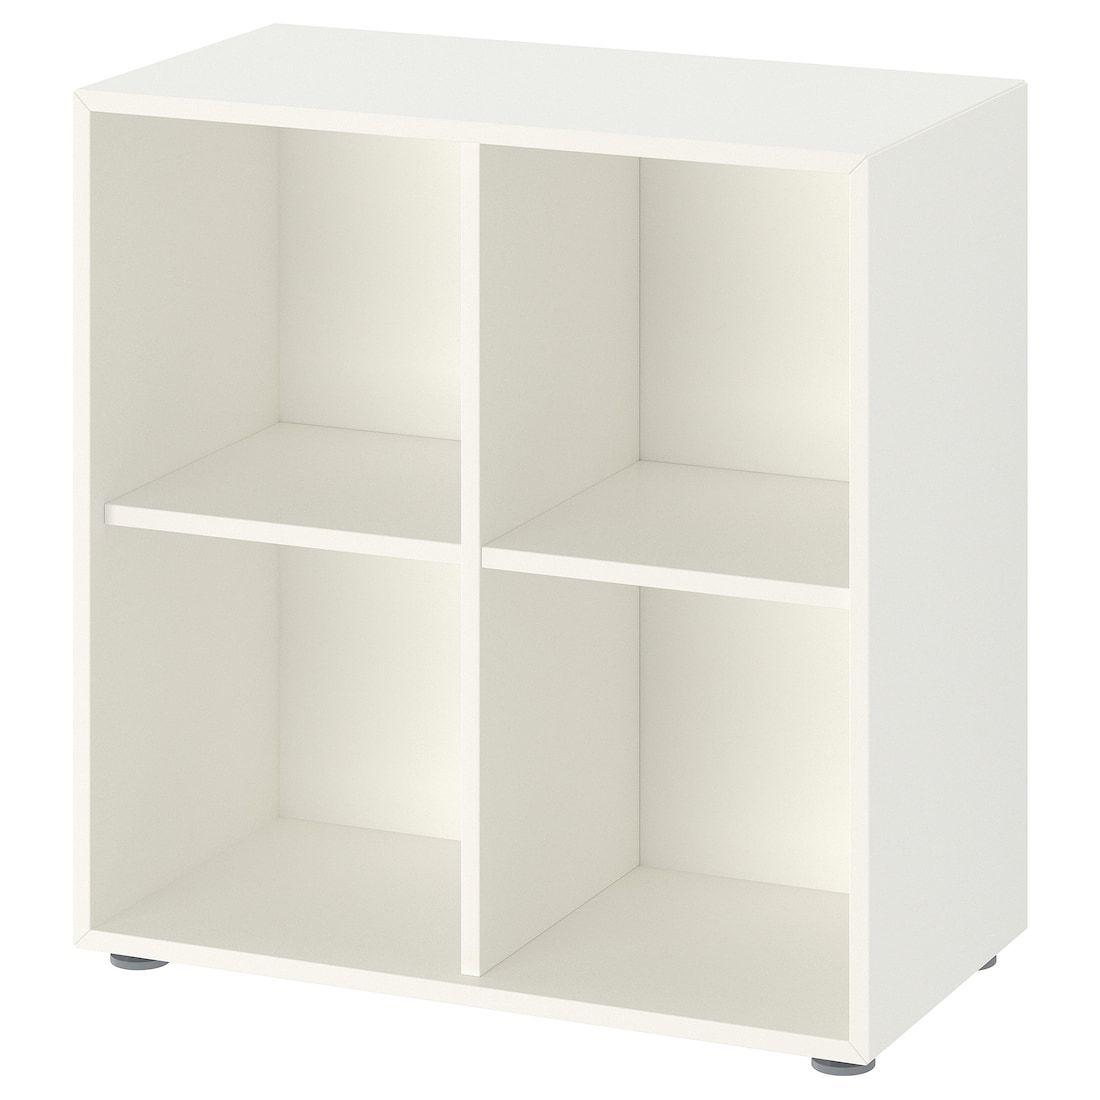 Eket Storage Combination With Feet White 27 1 2x13 3 4x28 3 8